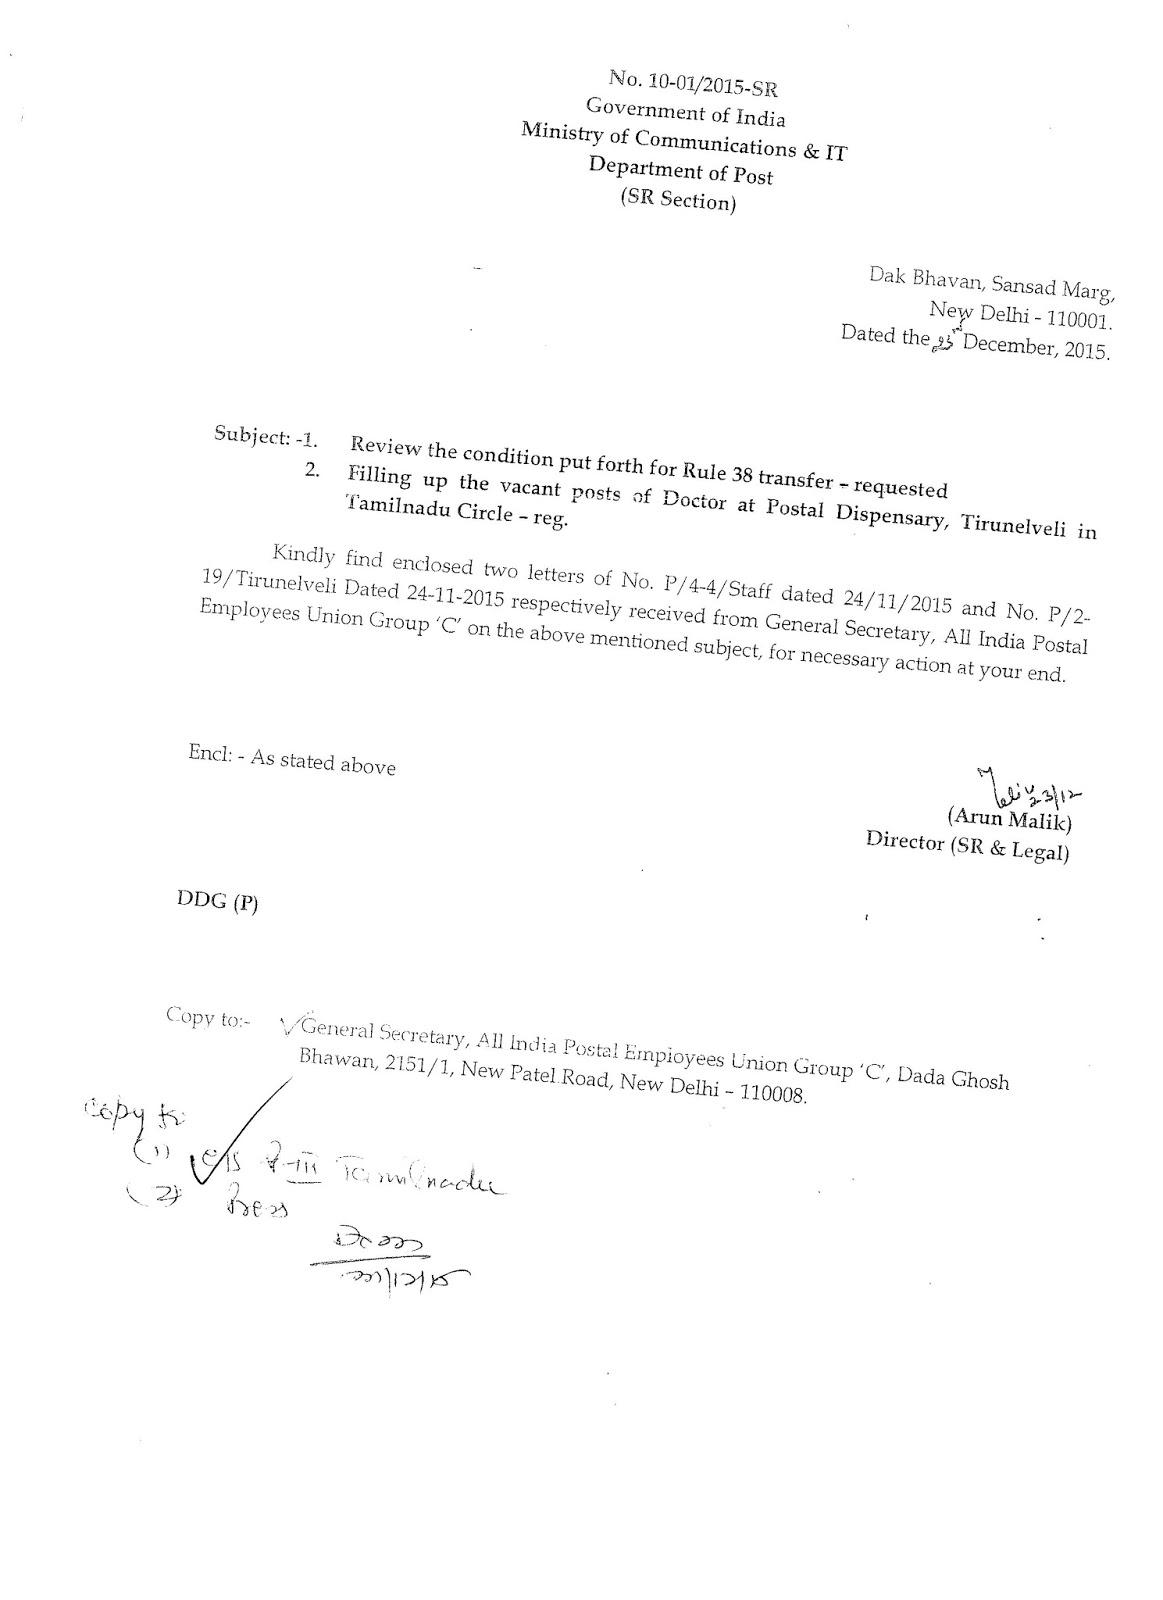 All India Postal Employees Union Group C Tn Circle